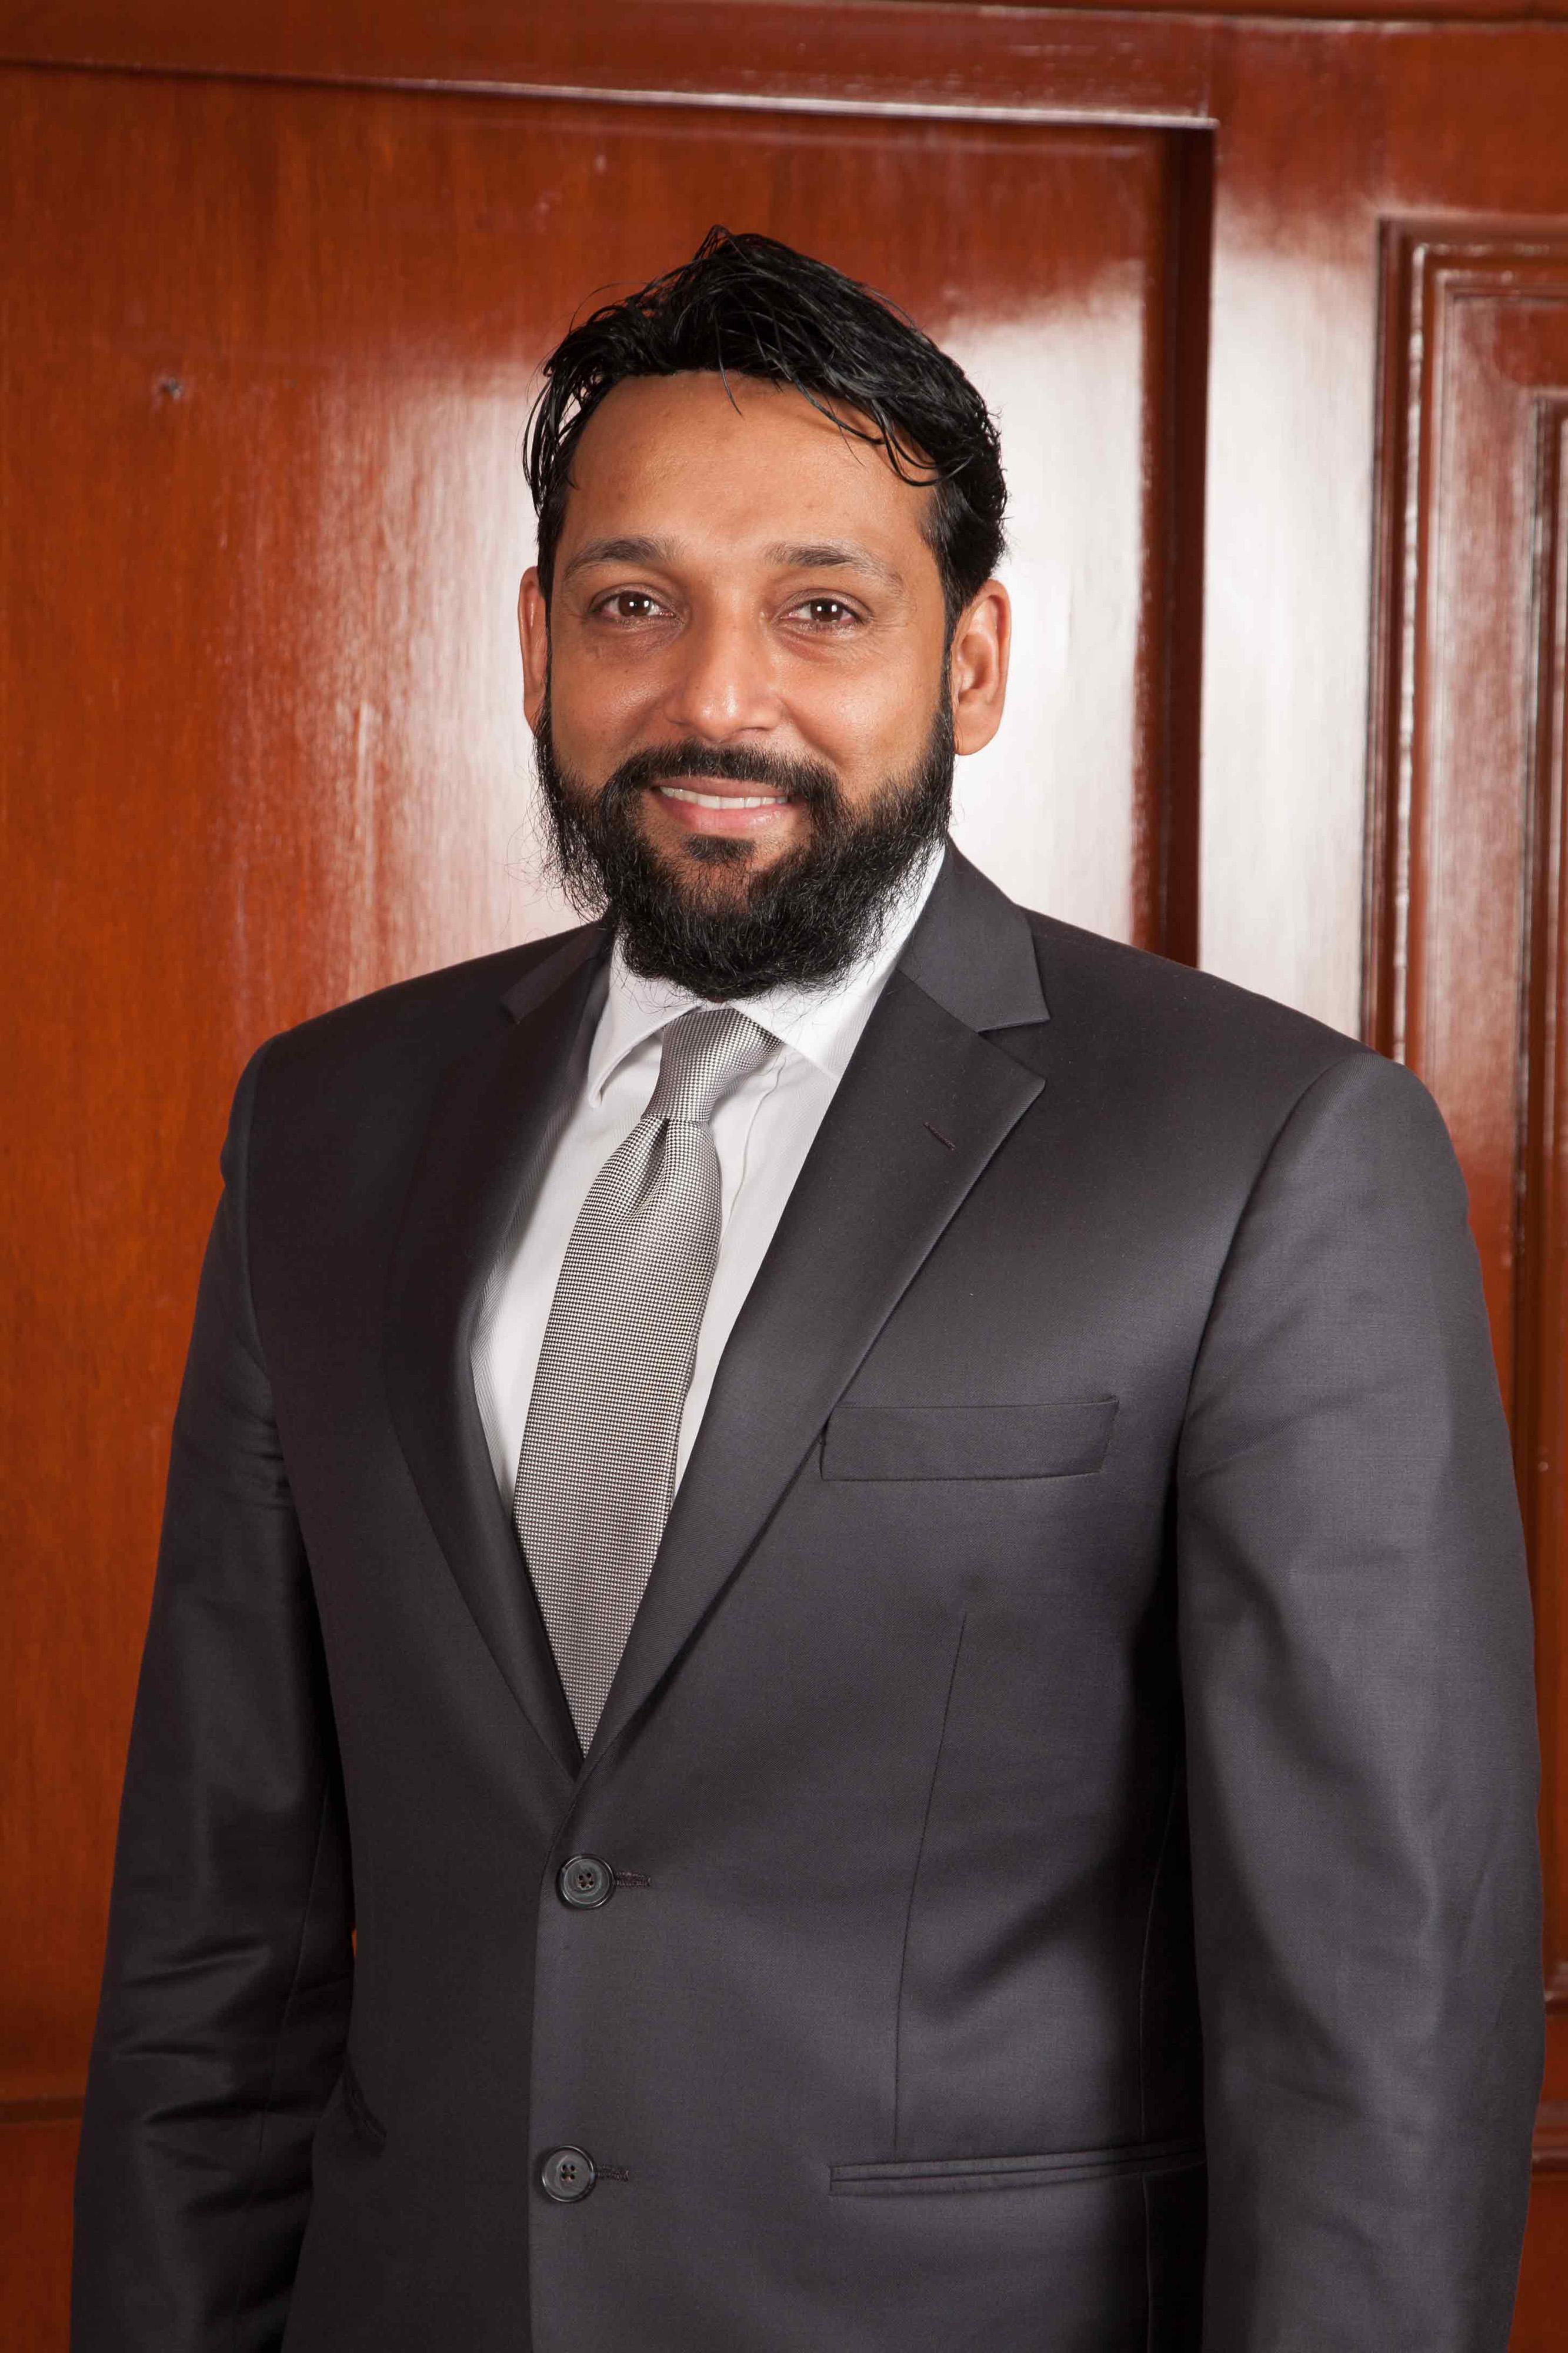 Ali Asghar Jamali, CEO, Indus Motor Company - 1a